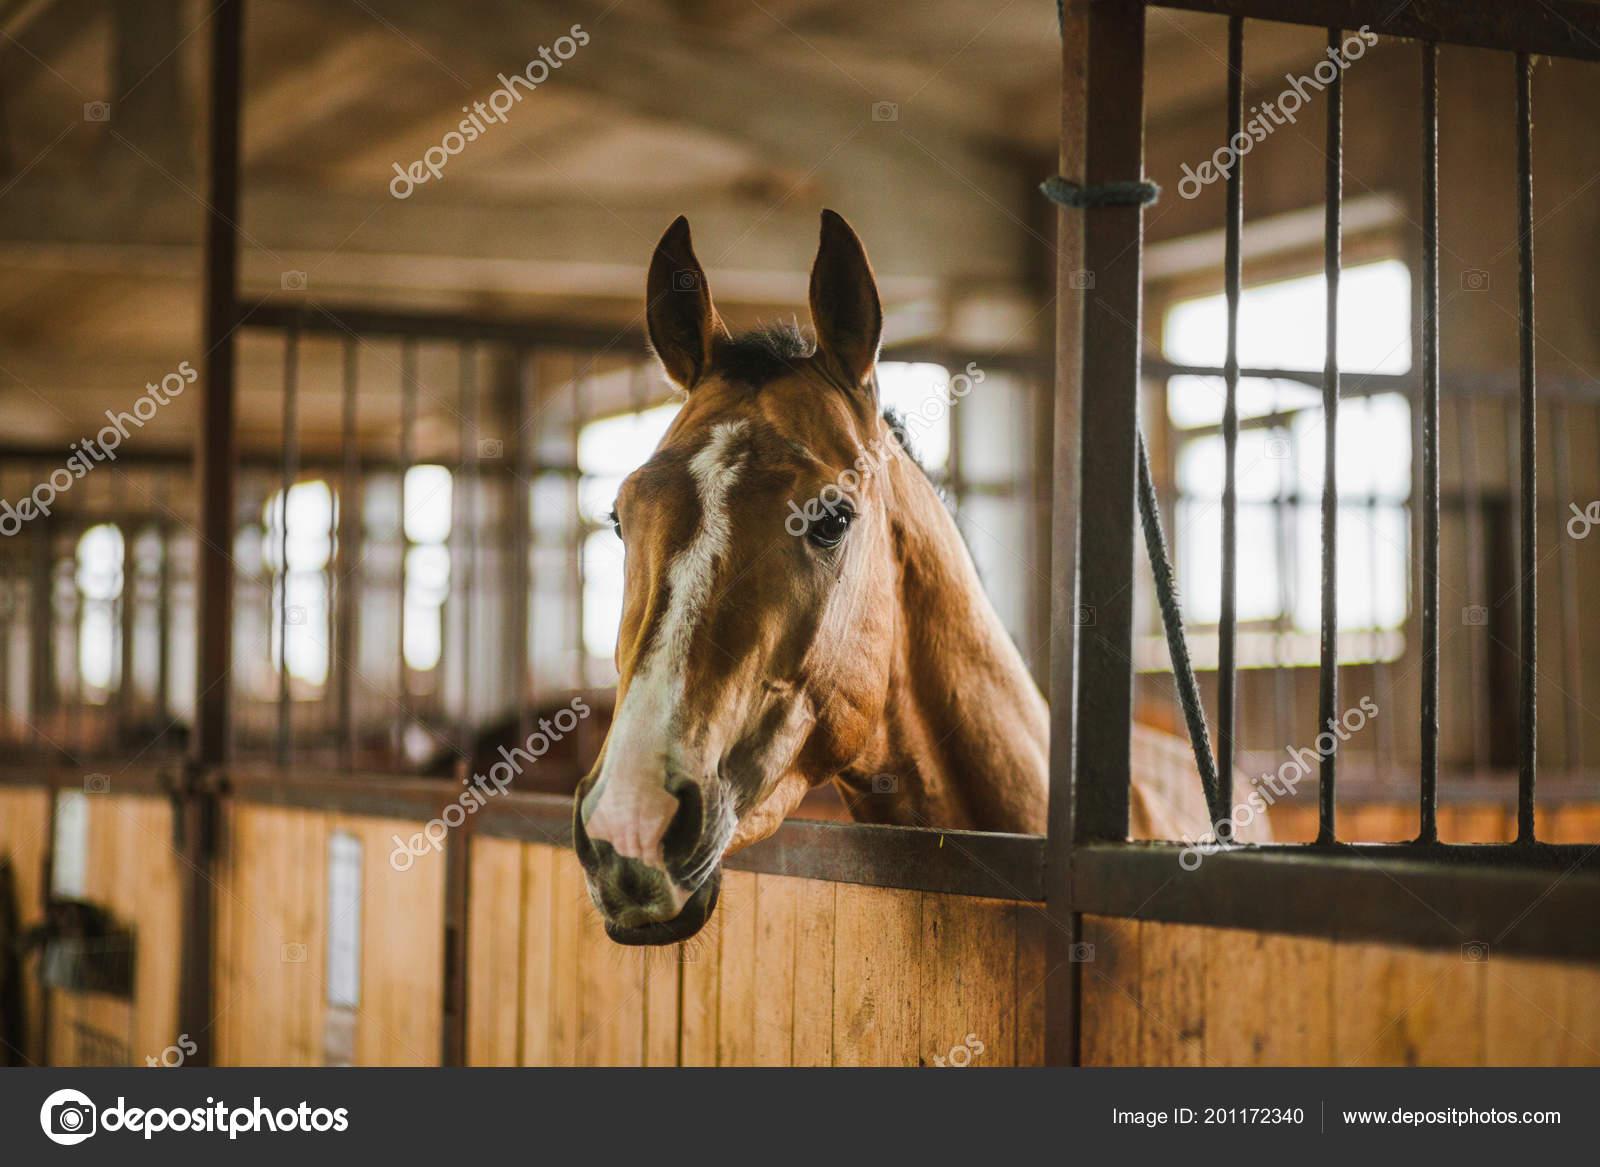 Beautiful Horses Animals Pasture Stables Horseback Riding Stock Photo C Vitizh 201172340